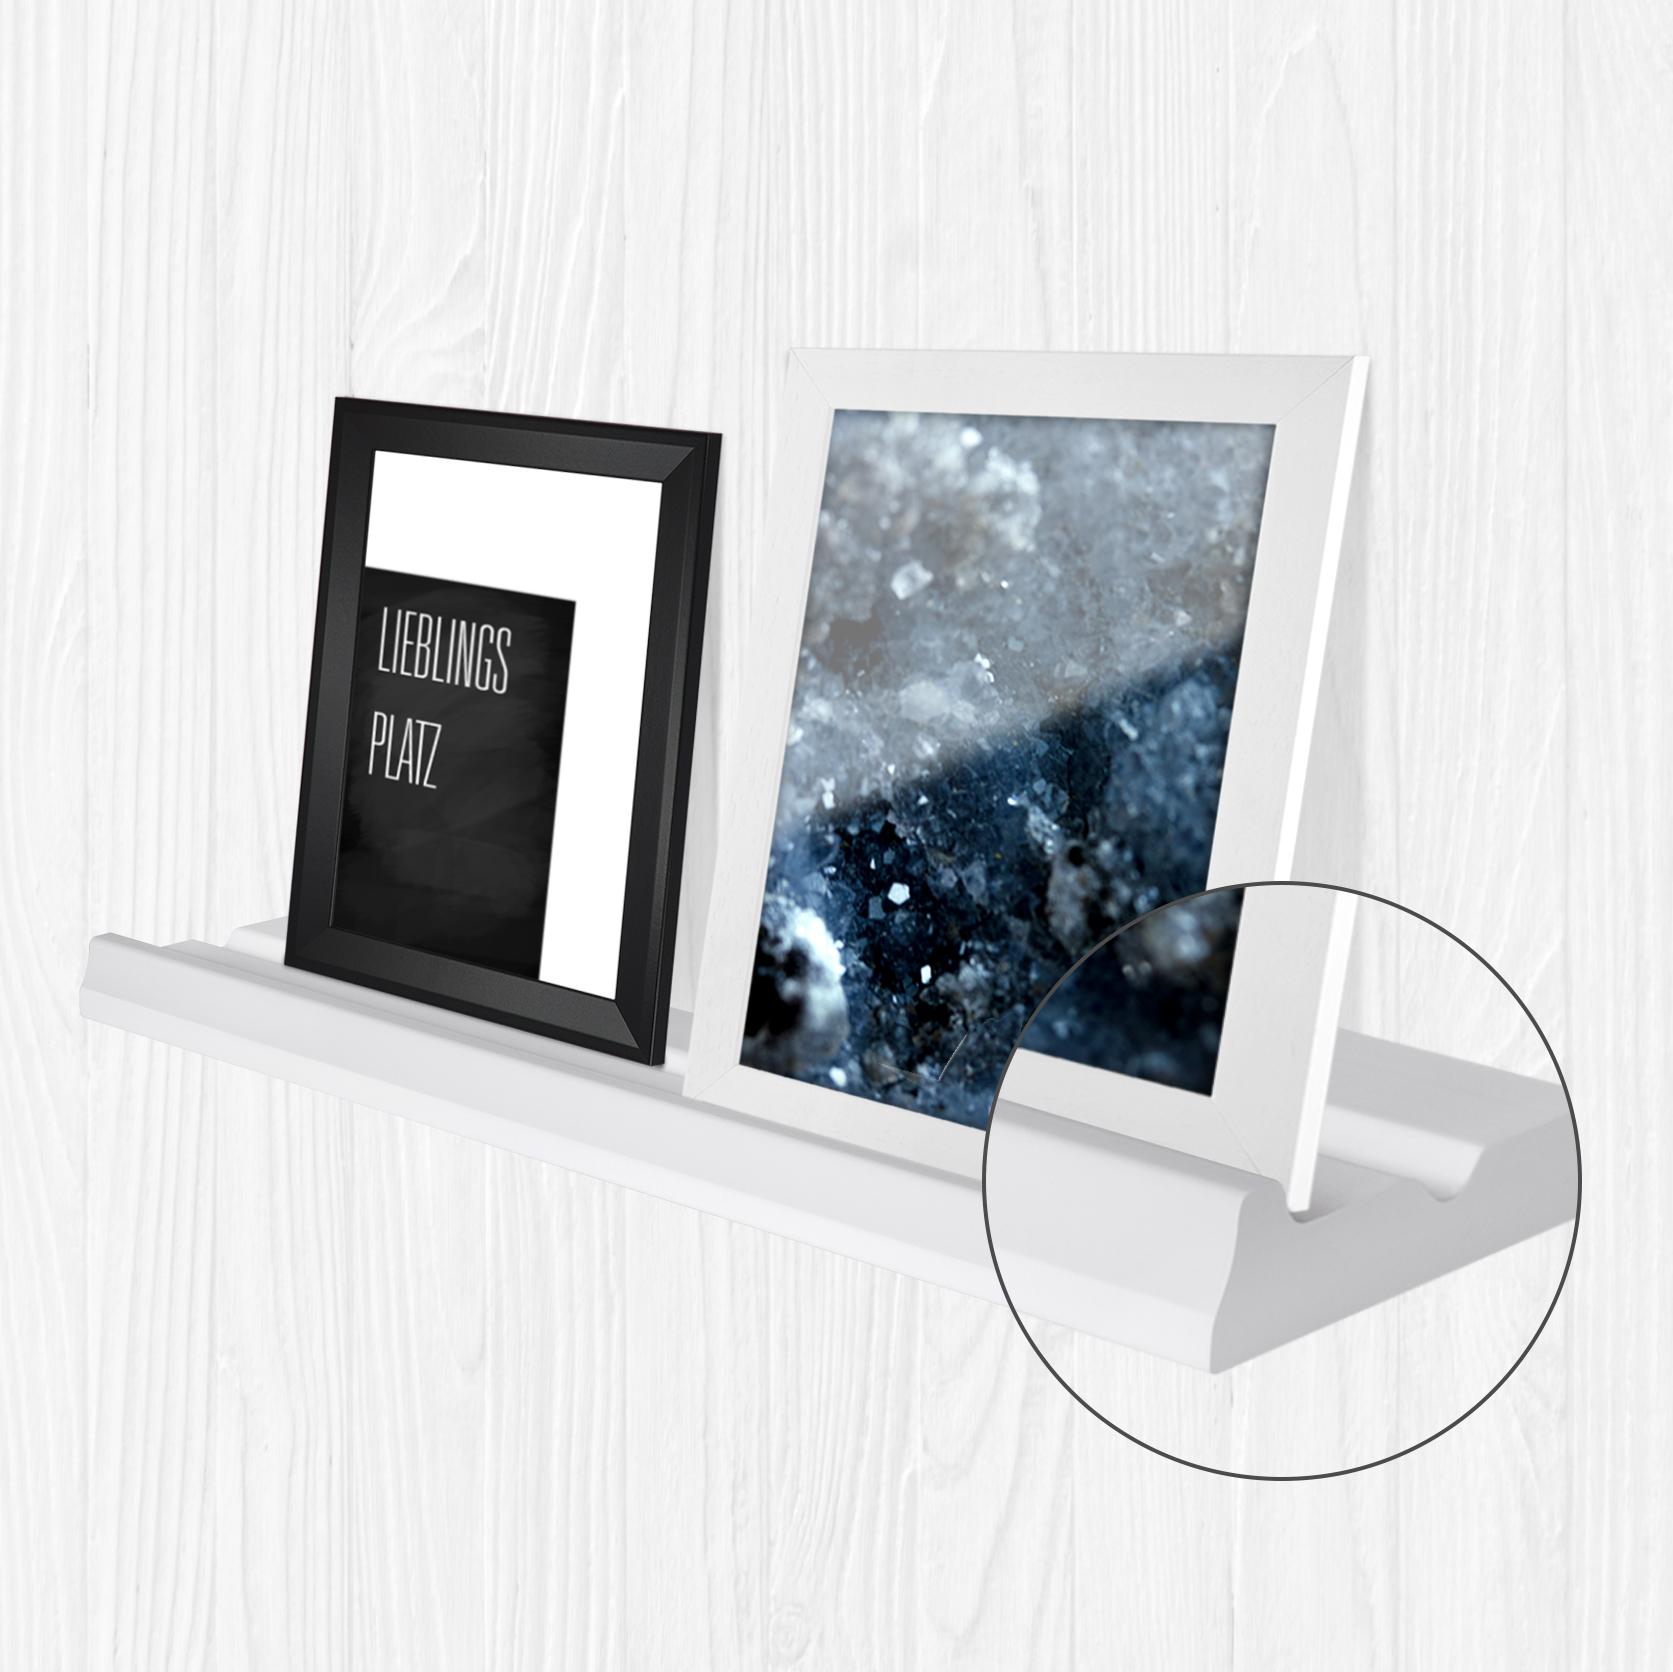 bilderleiste bord f r bilderrahmen dekoartikel schwarz. Black Bedroom Furniture Sets. Home Design Ideas